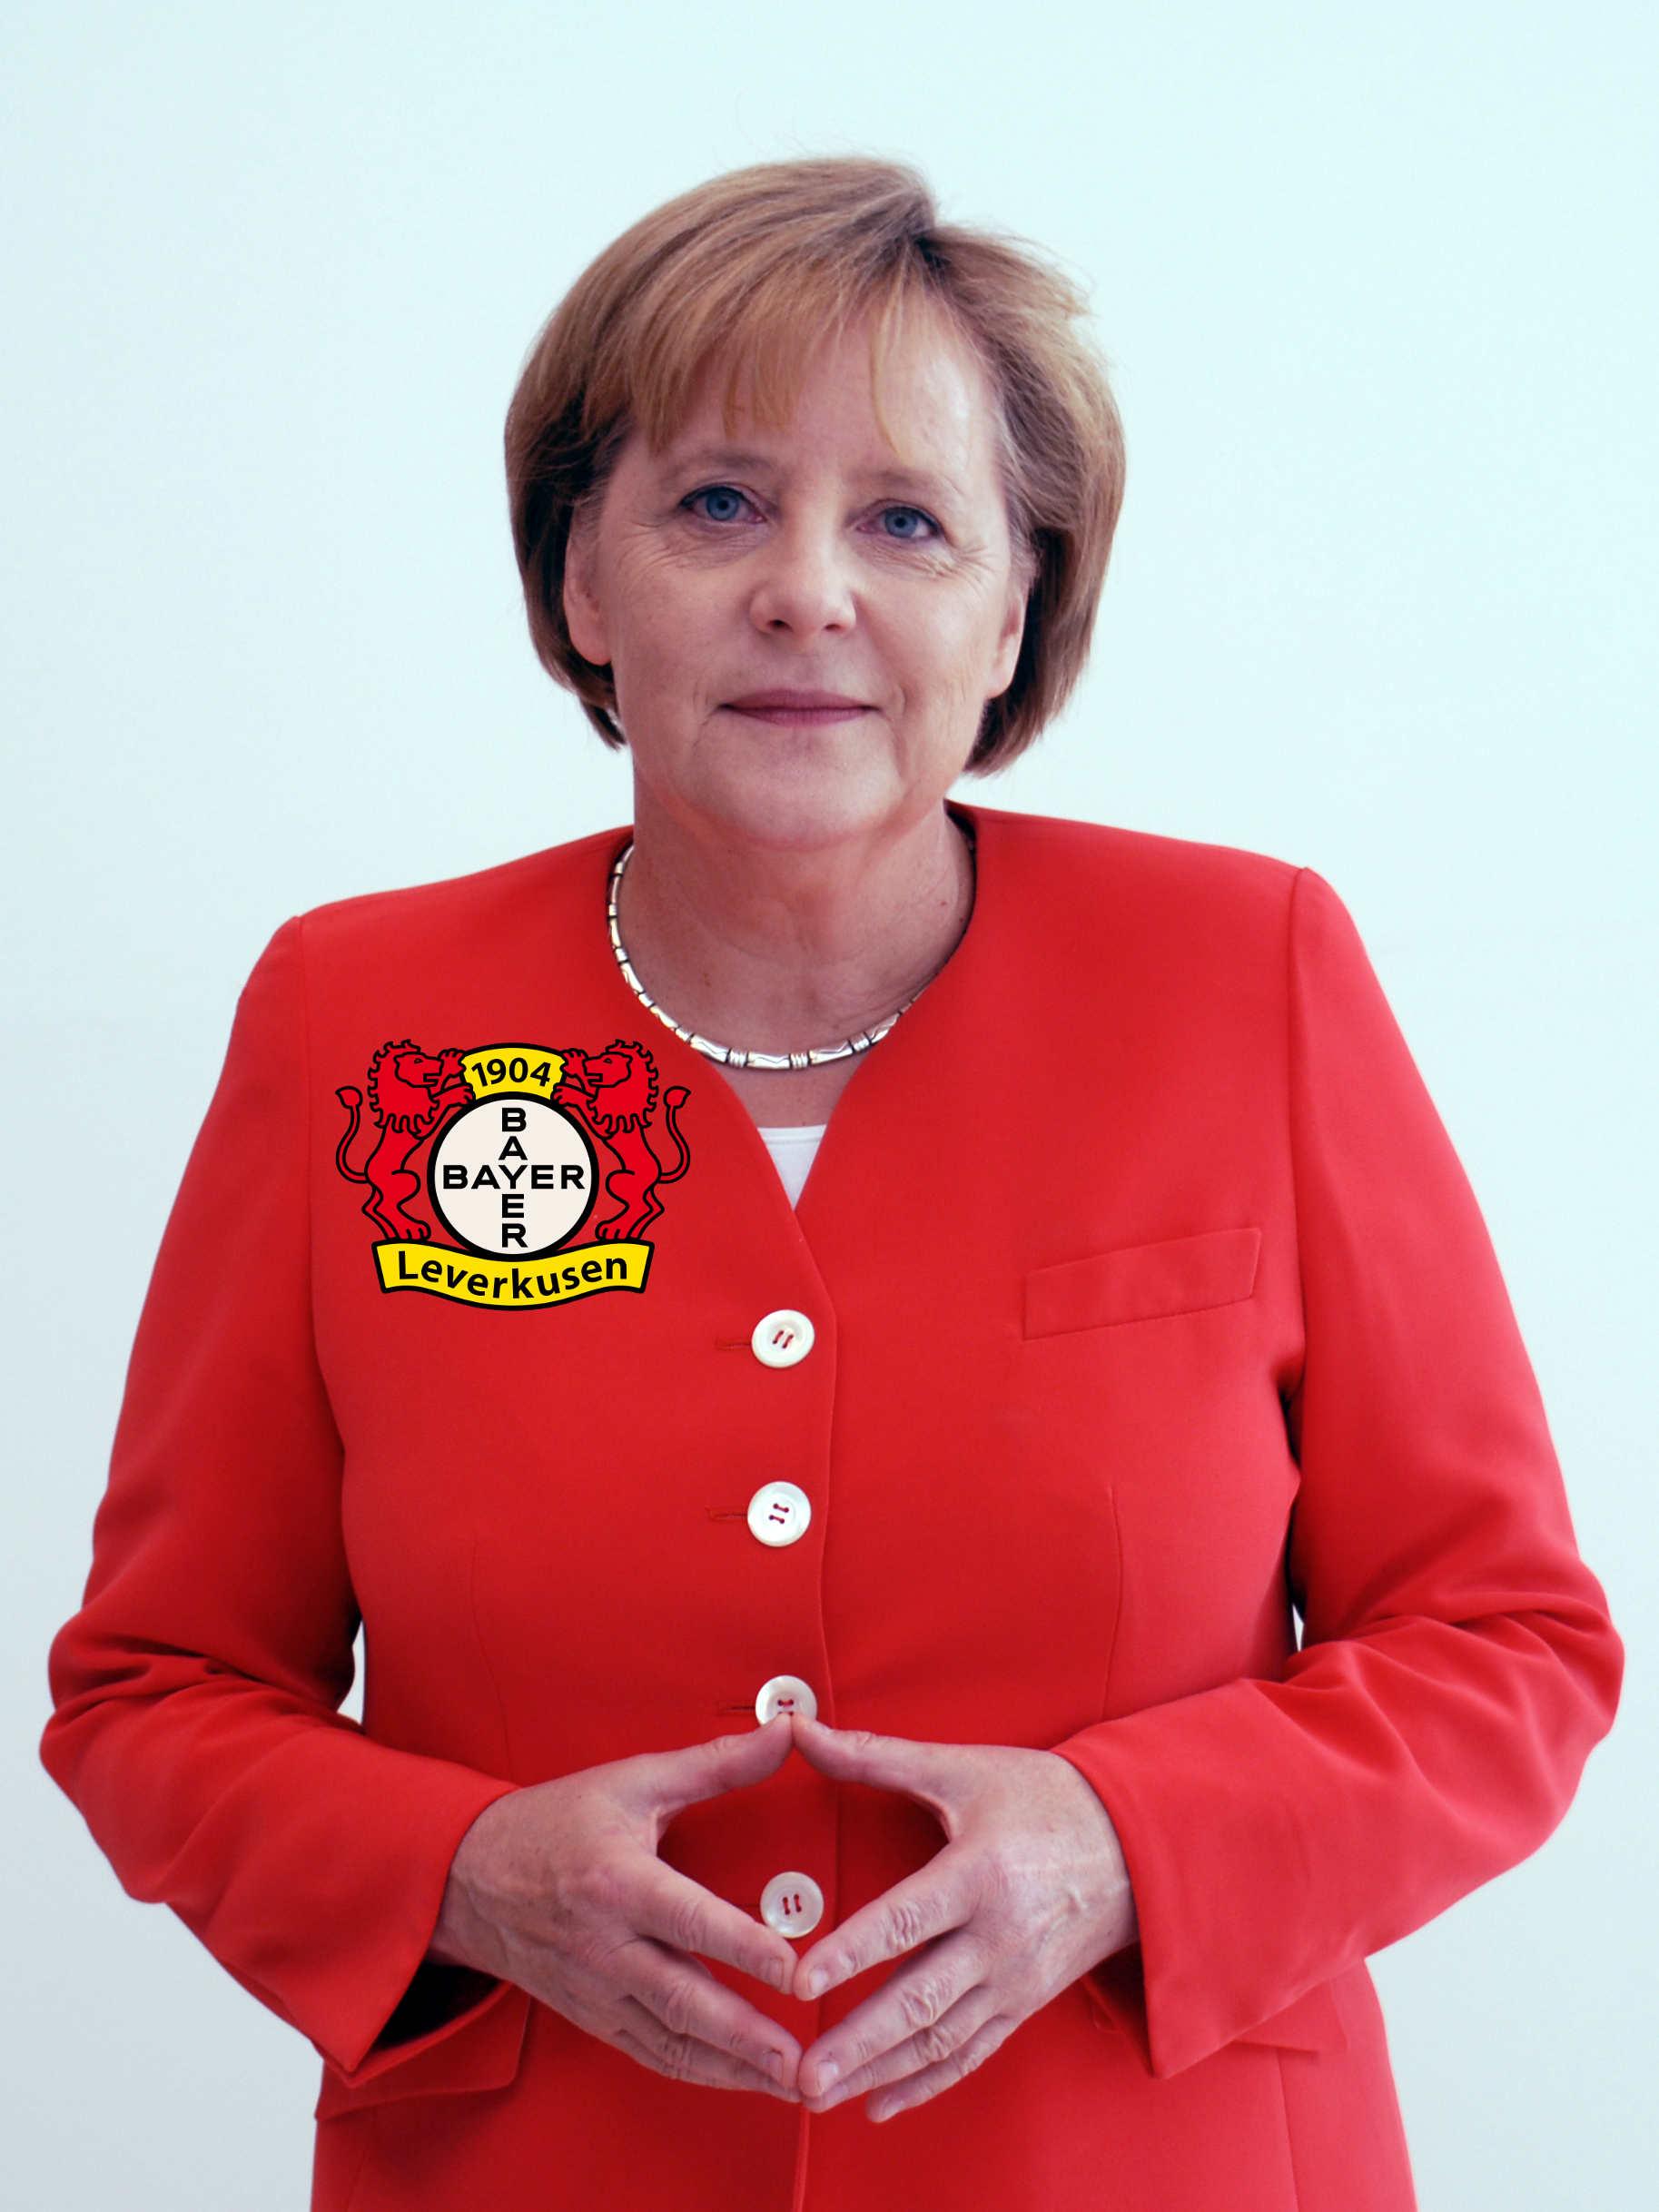 Merkel CC BY-SA 3.0 DE -Armin Linnartz_